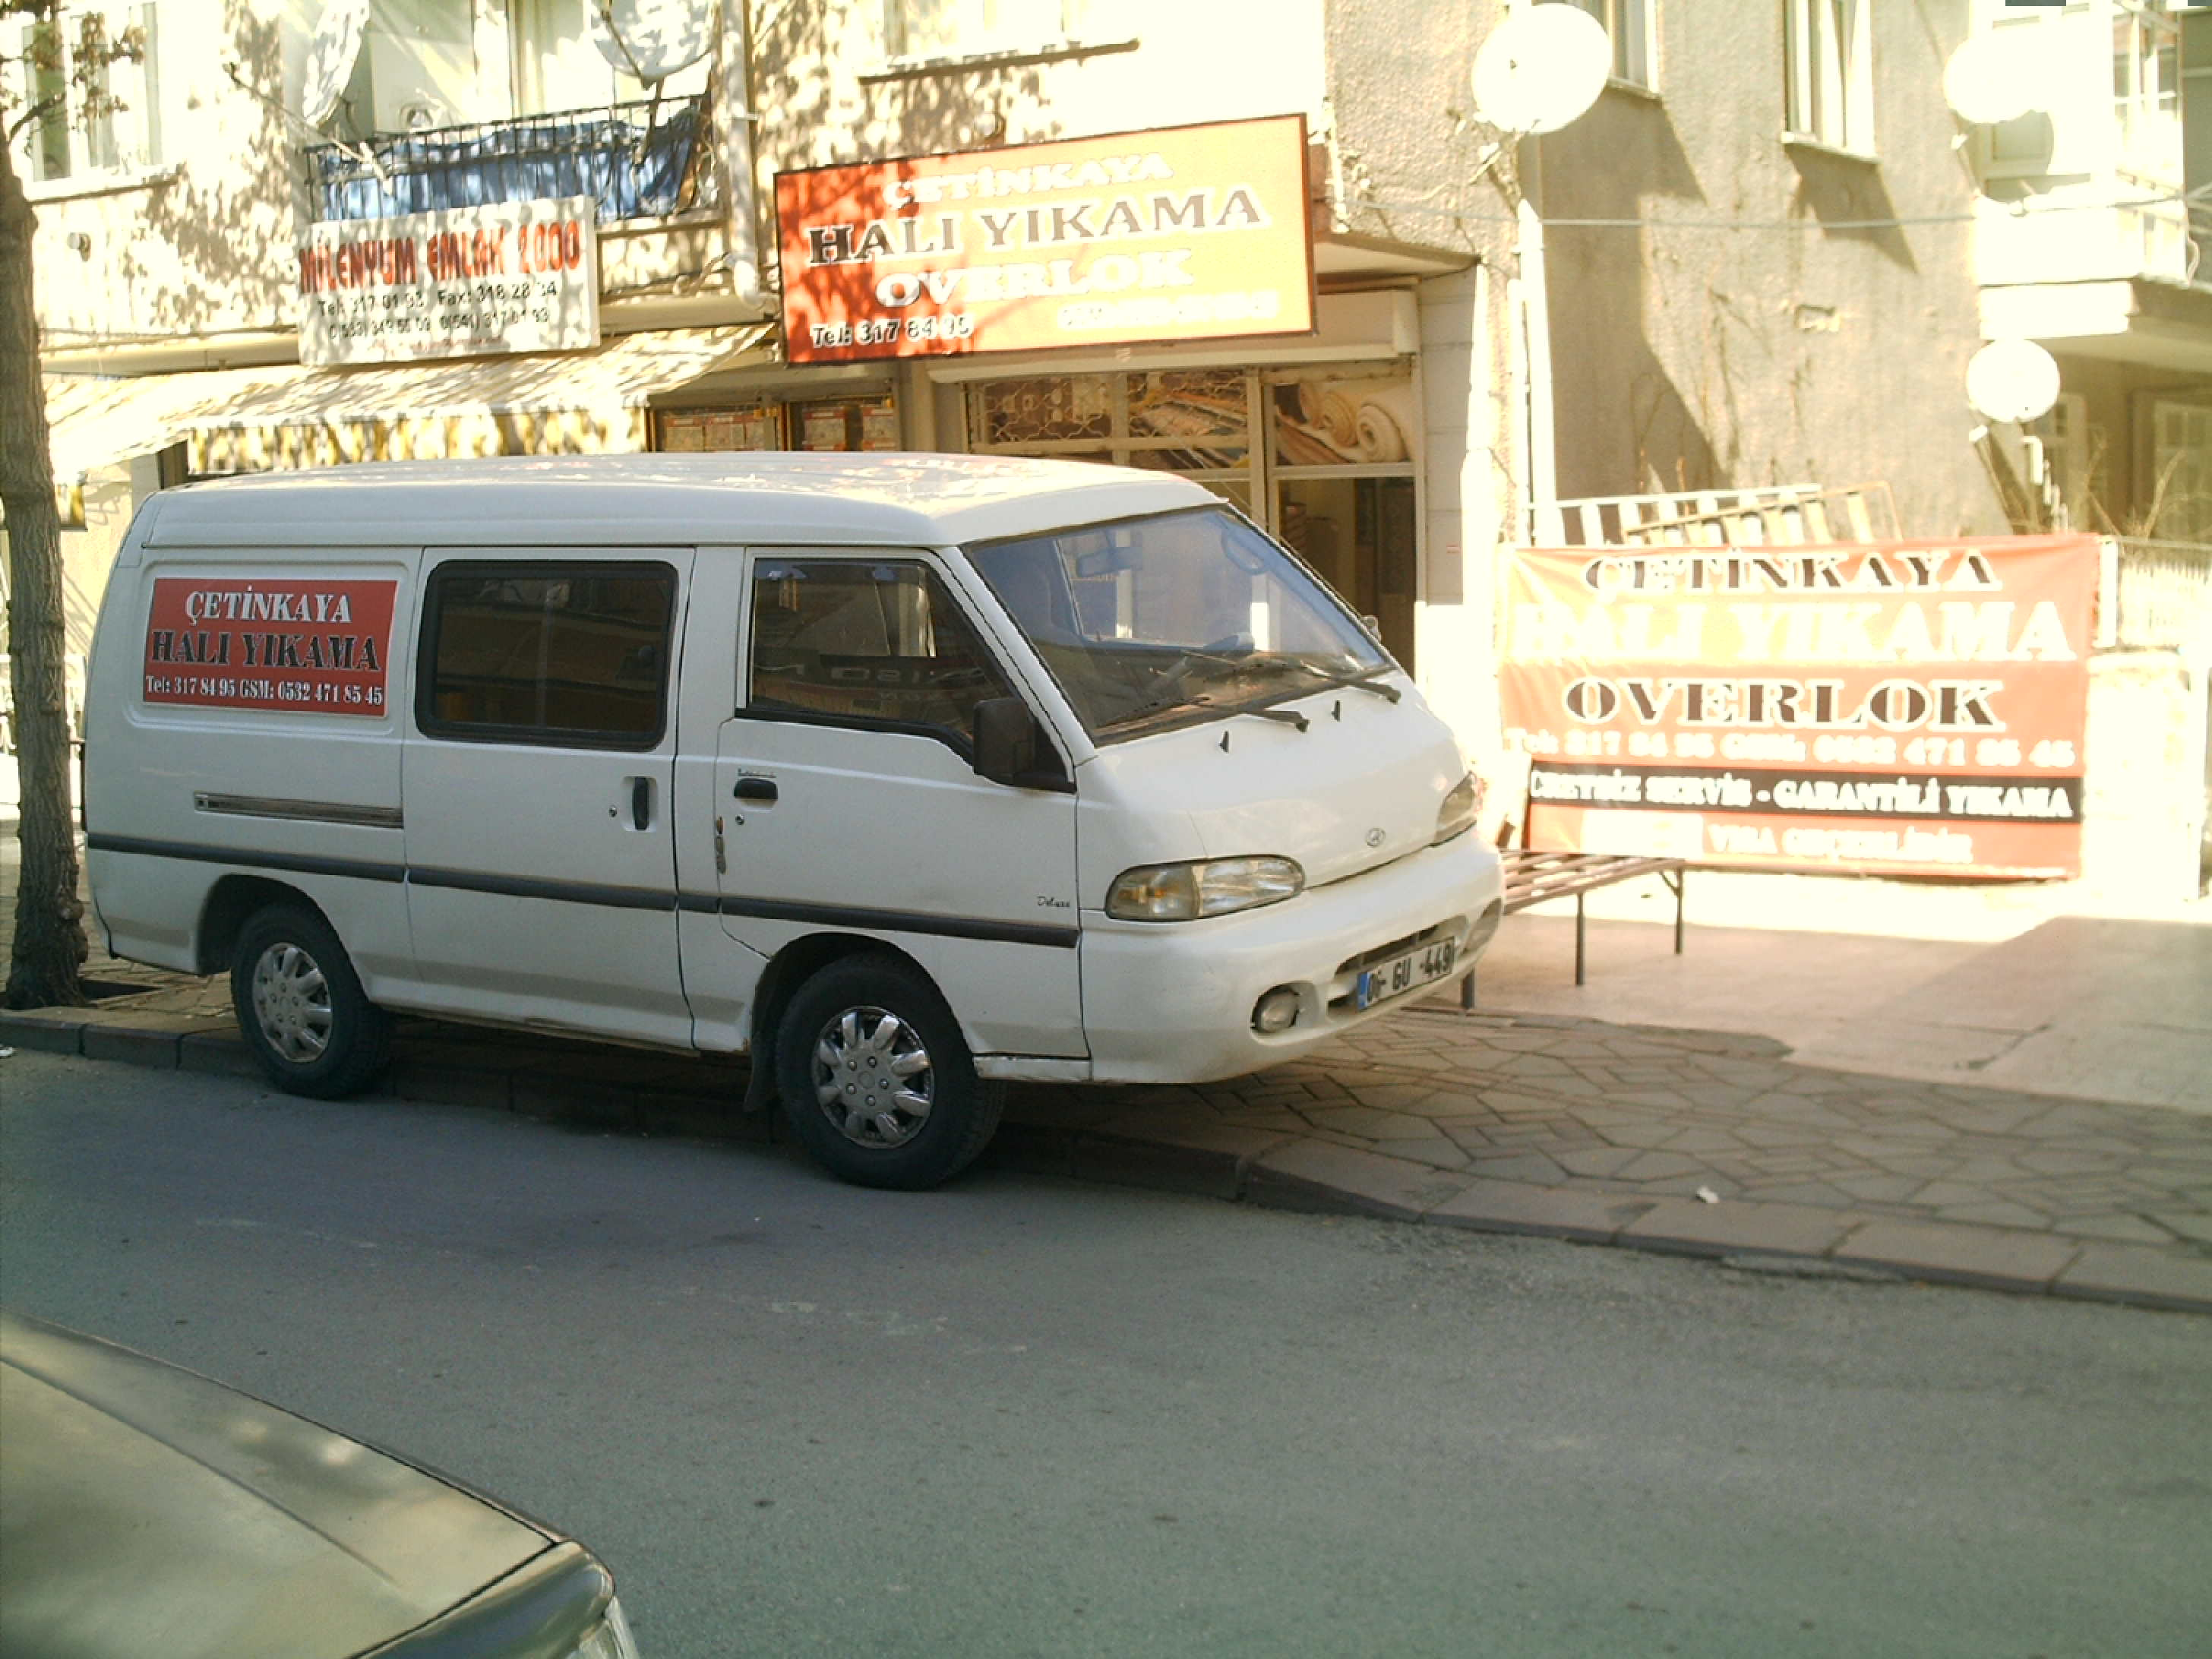 hüseyin_gazi_hali_yikama_servis-1 (1)